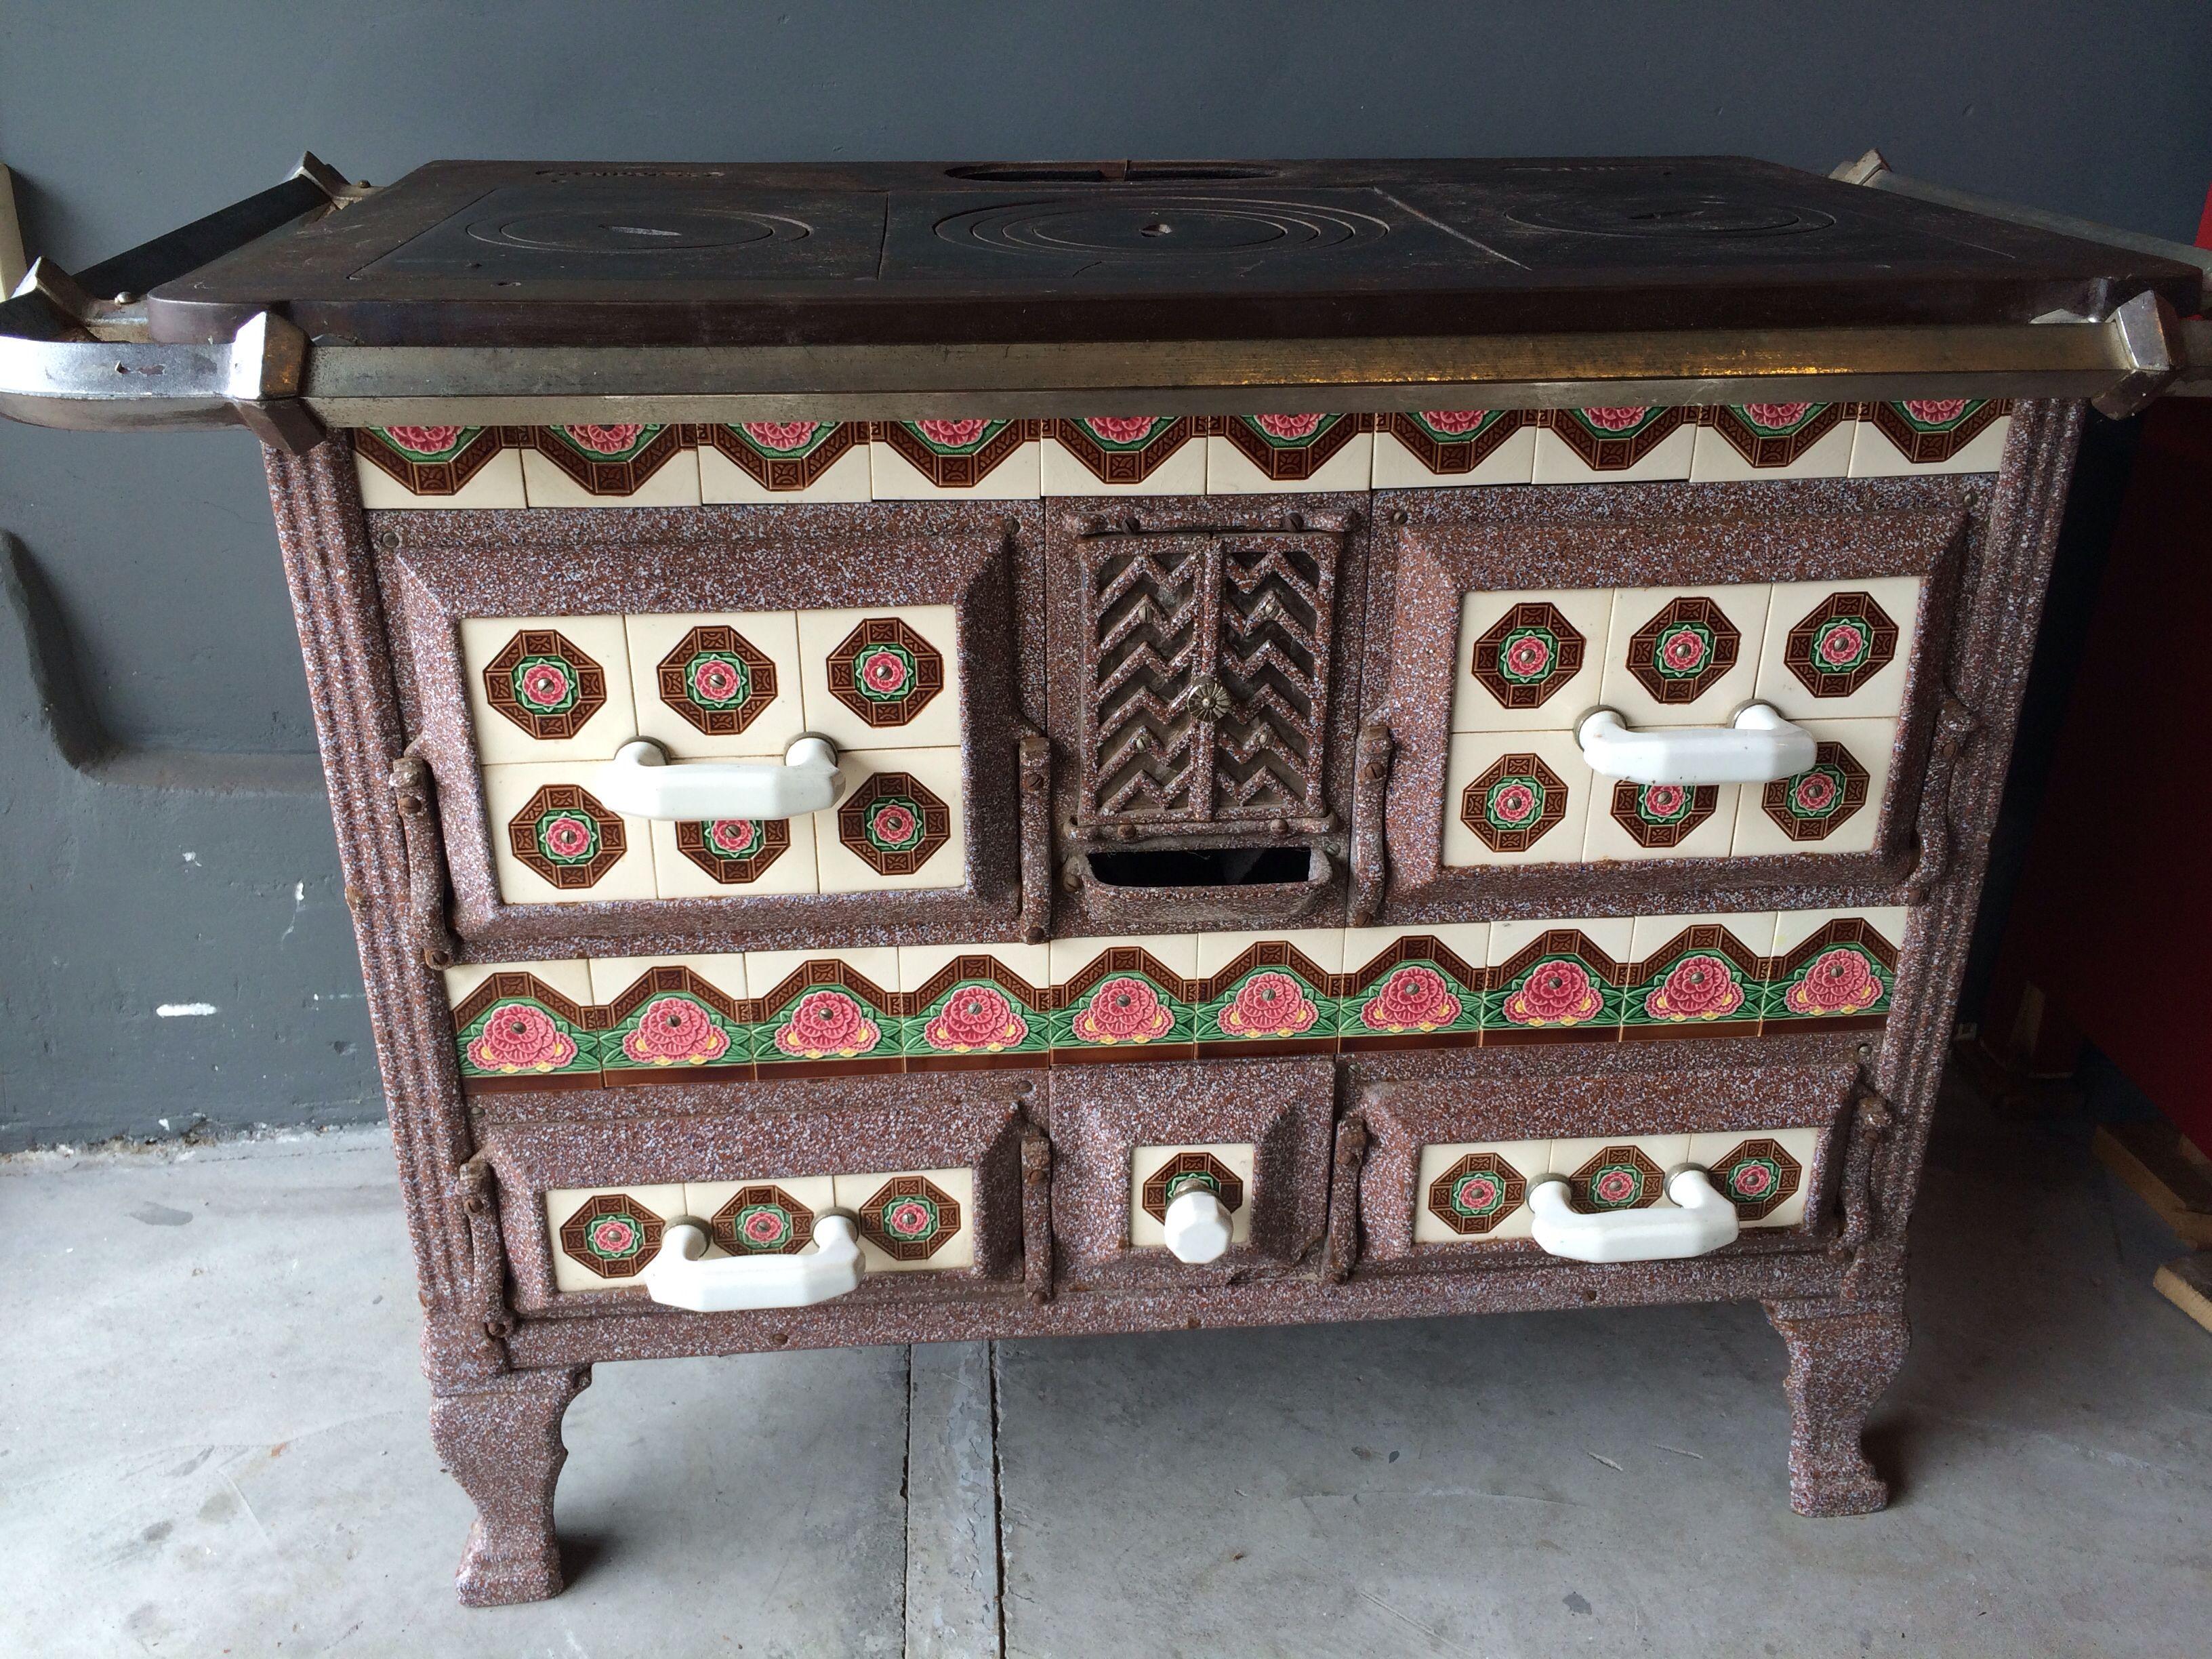 Afbeelding van http://www.lovt.nl/wp-content/uploads/2014/09/fornuis-kachel-+-loft-+-lovt-+-industrieel-+-retro-en-vintage-design-meubels.jpg.